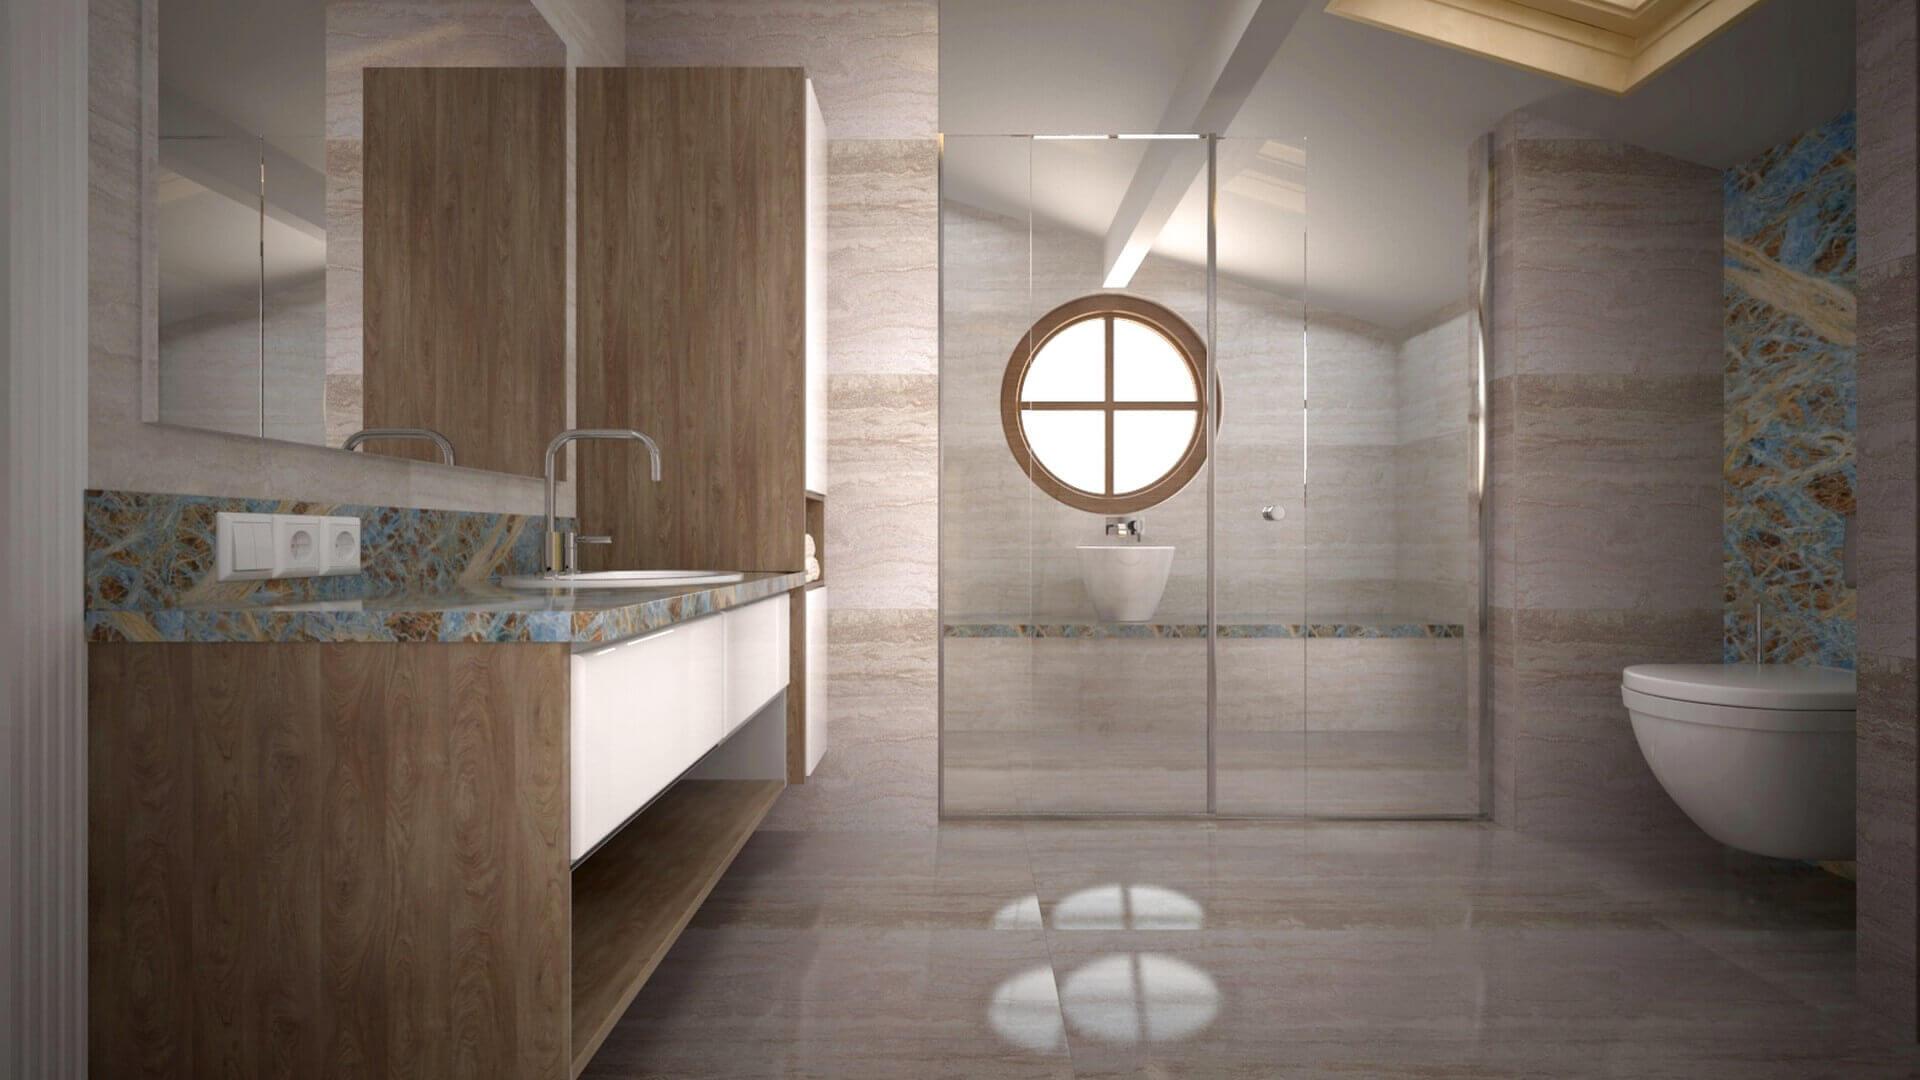 House interior designer 3451 Aslan House Residential